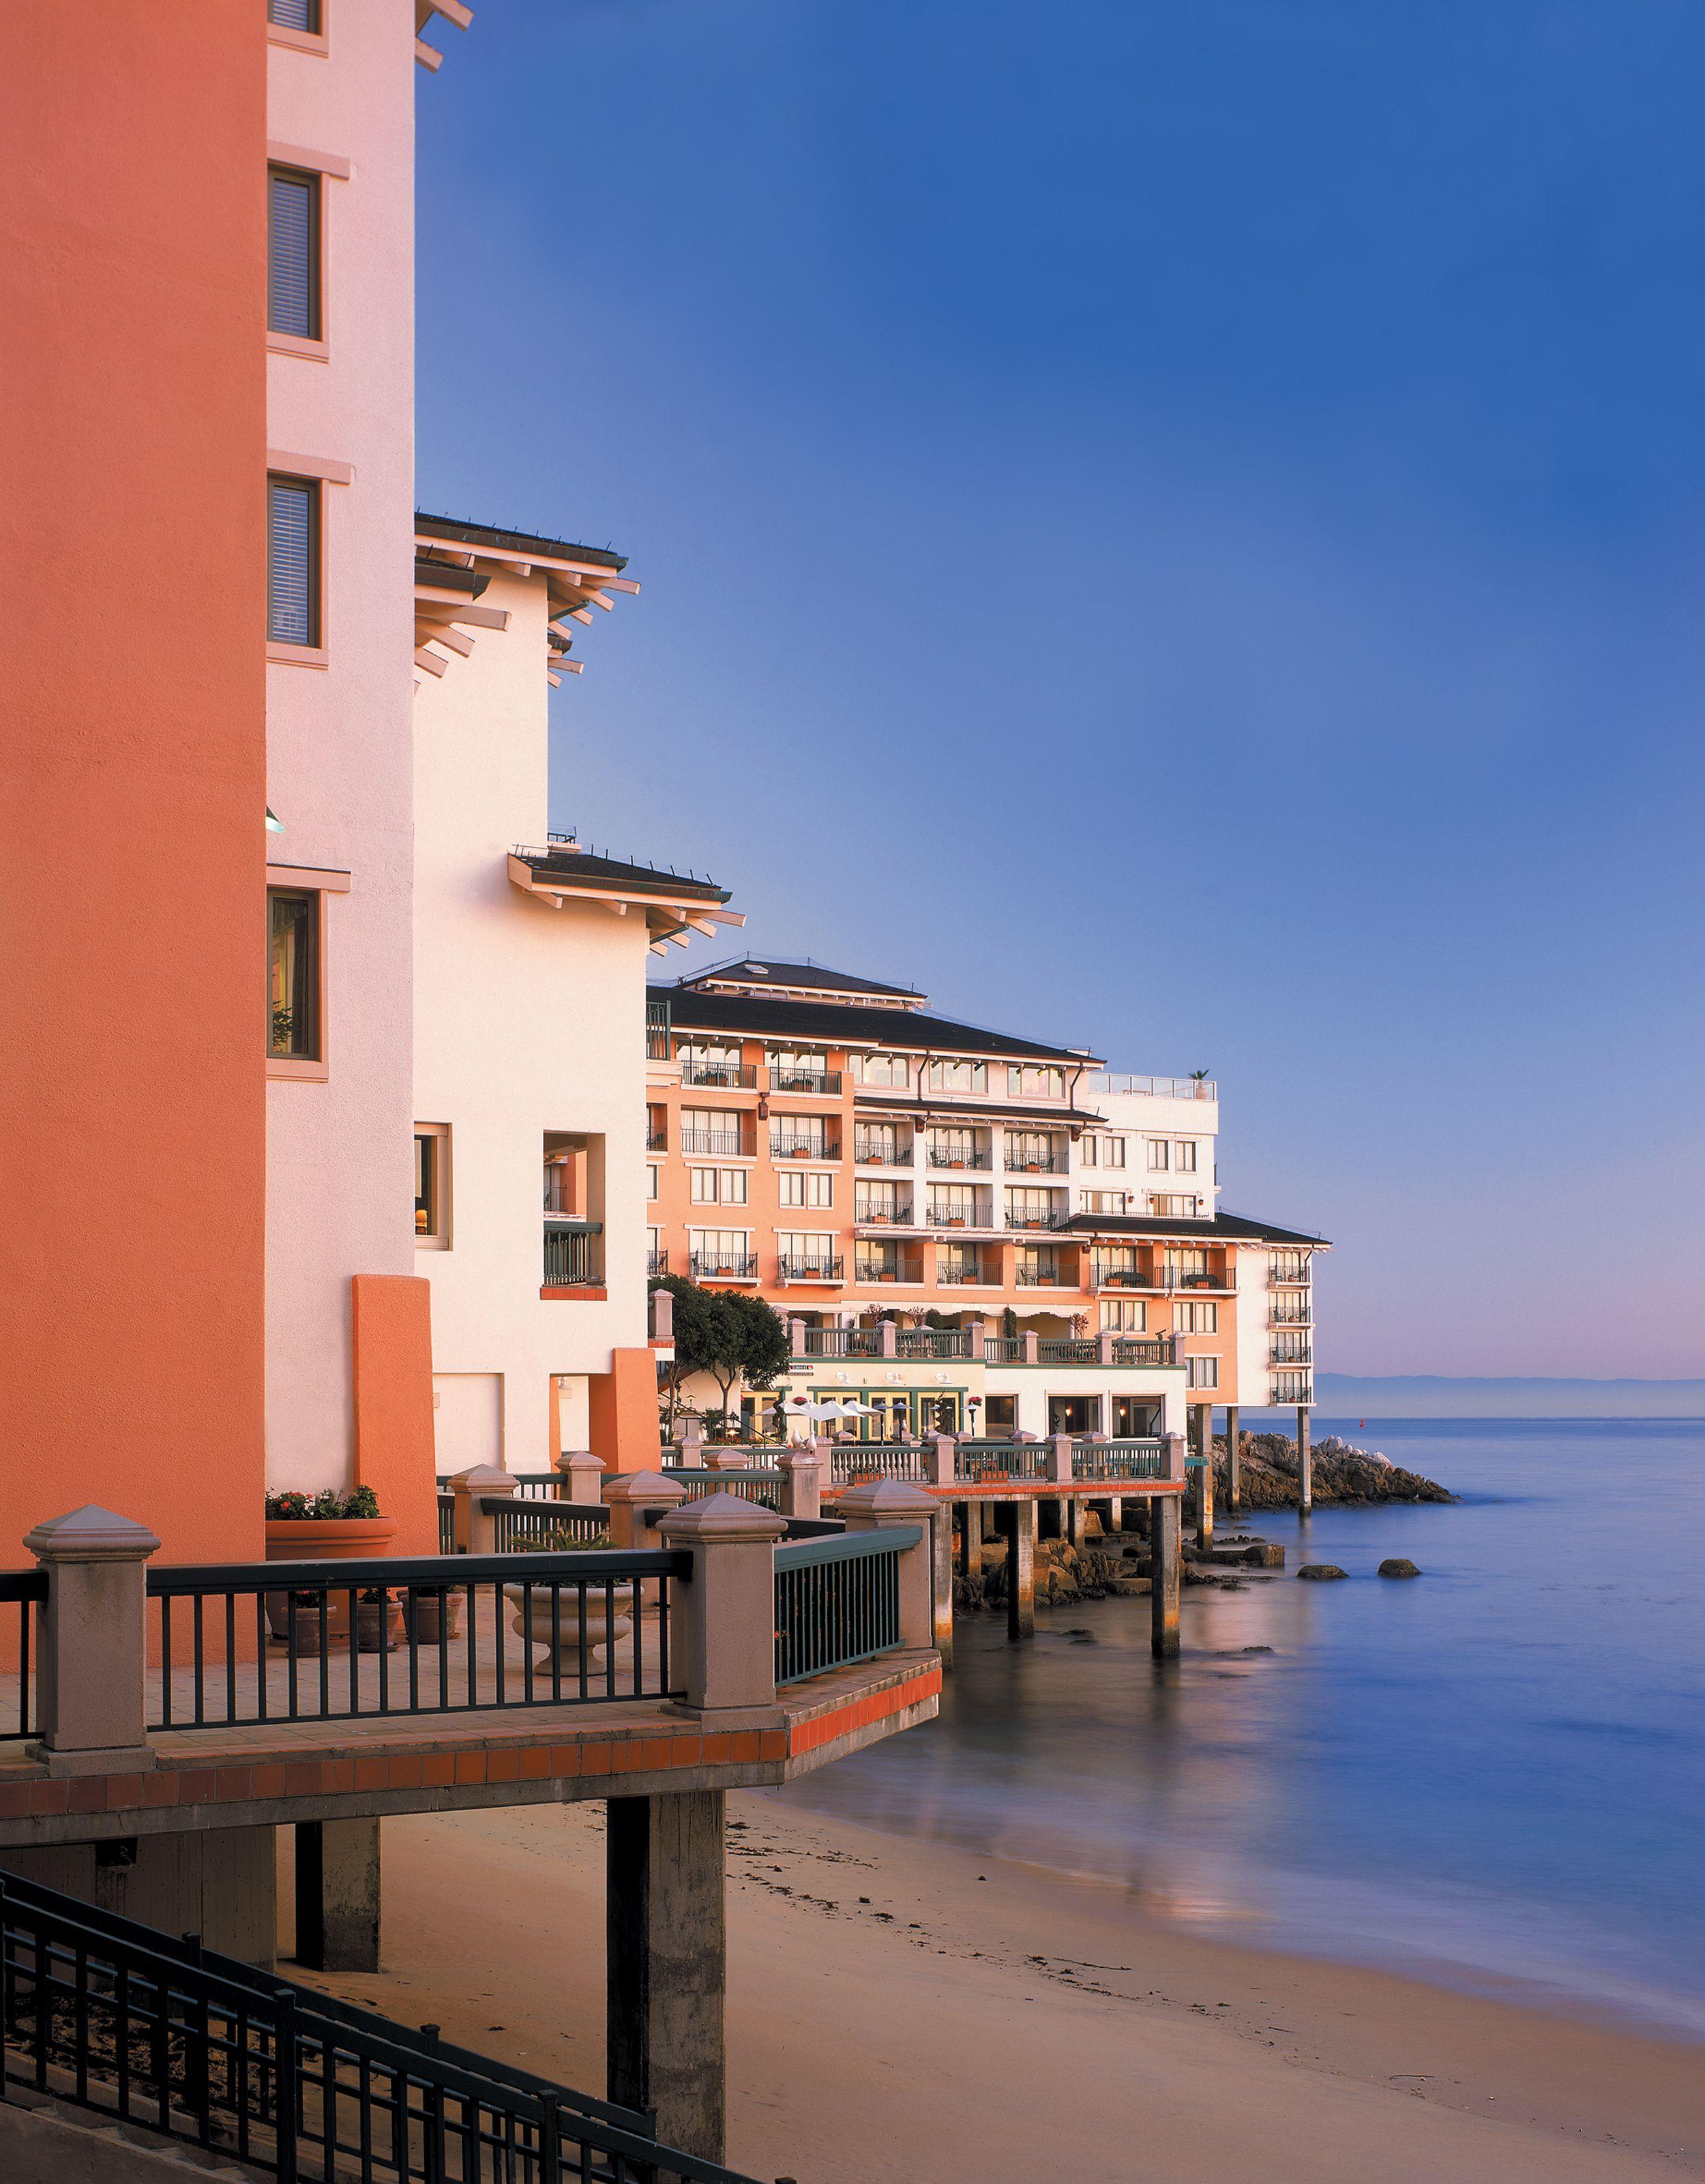 Exterior No Tree Monterey Plaza Bay Best Hotels In California